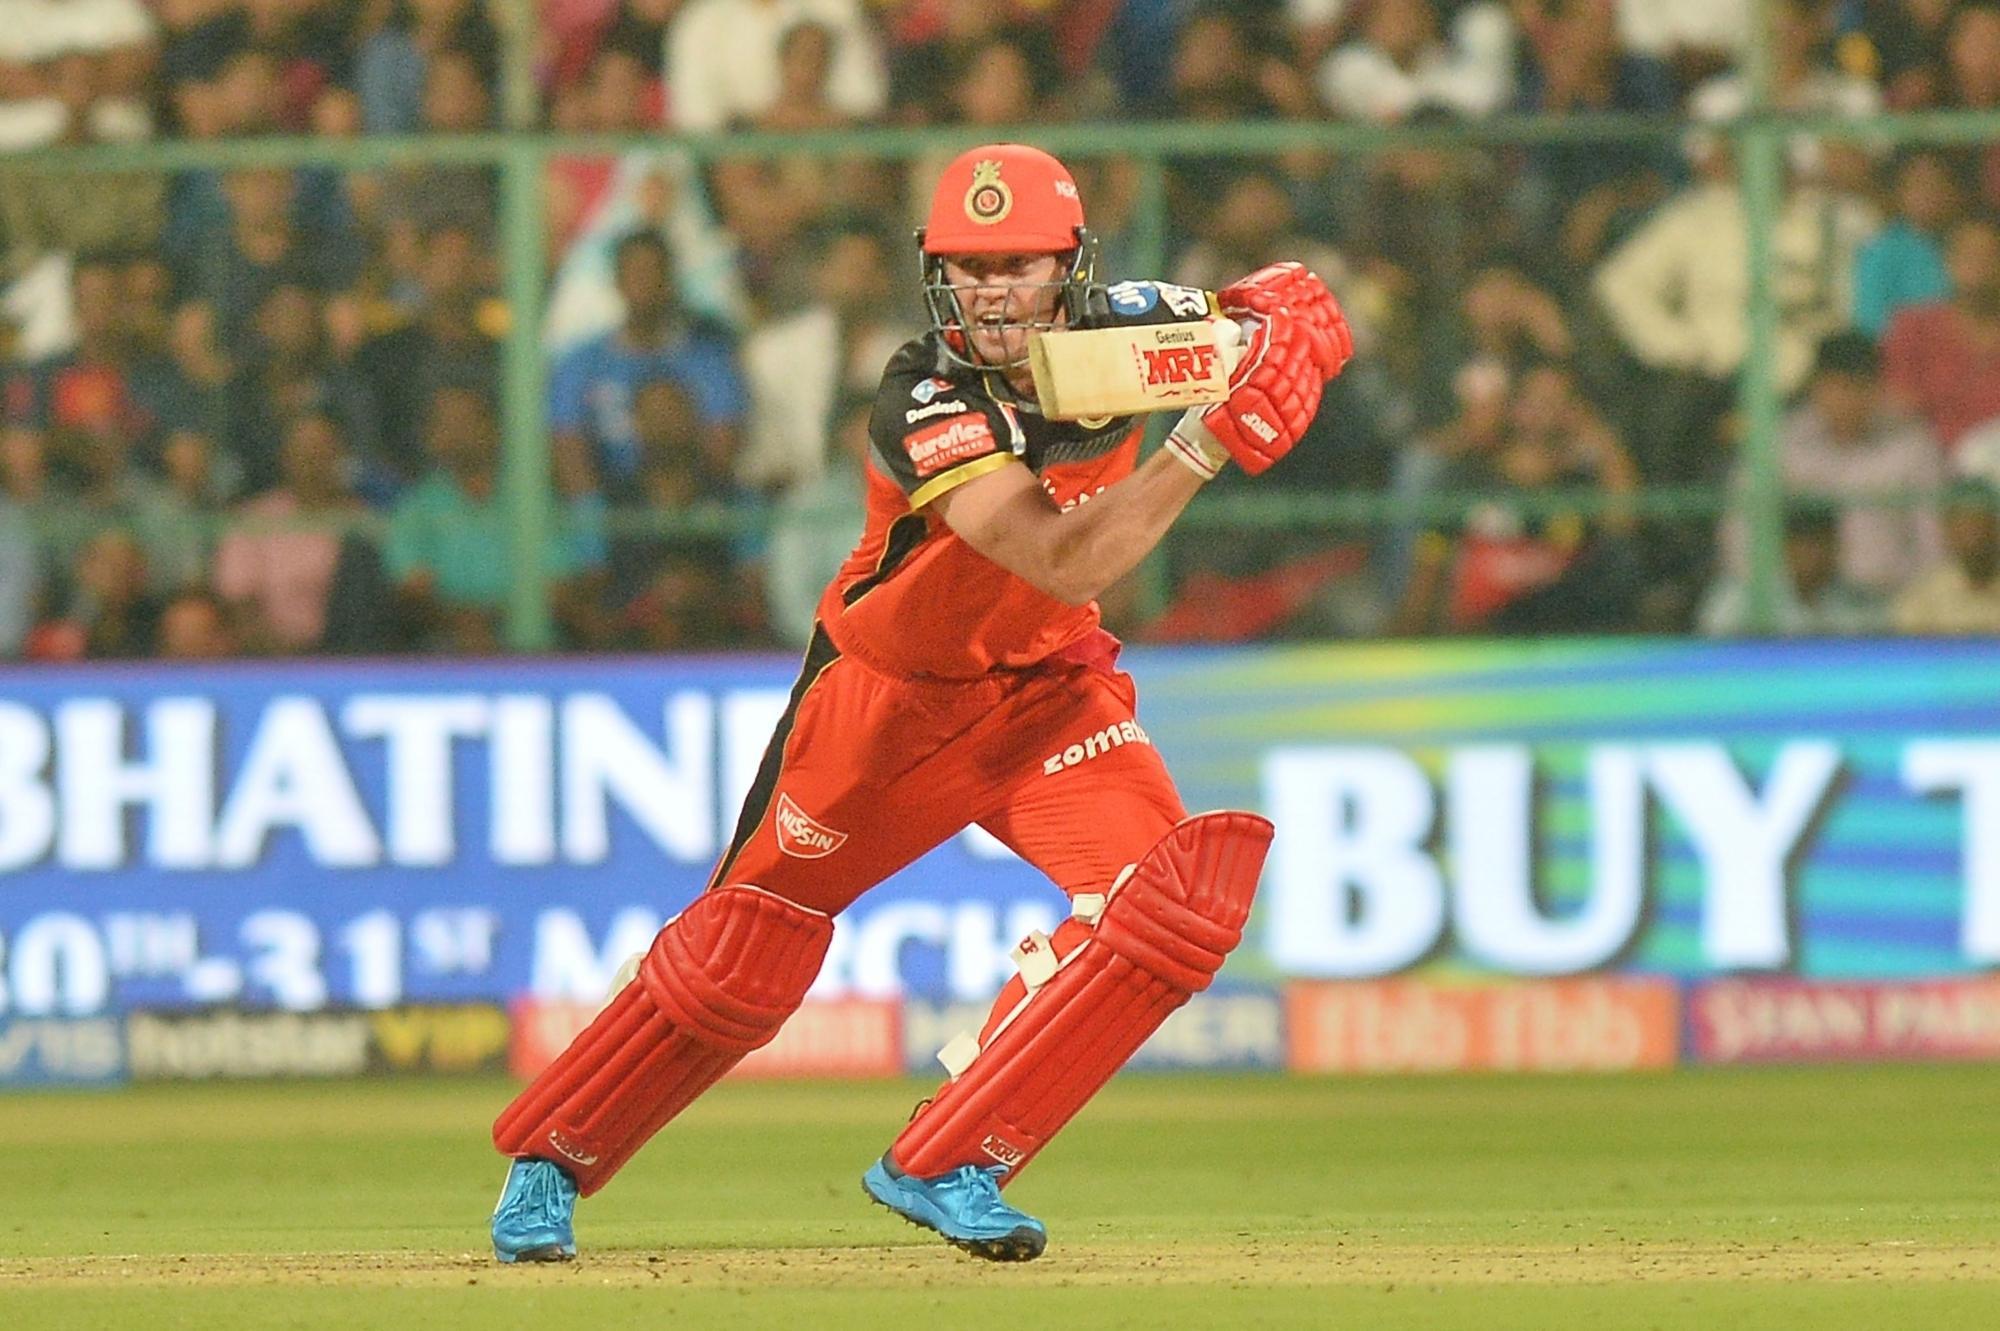 AB de Villiers played a brilliant knock of 70* runs off 41 balls against Mumbai Indians (photo - IANS)